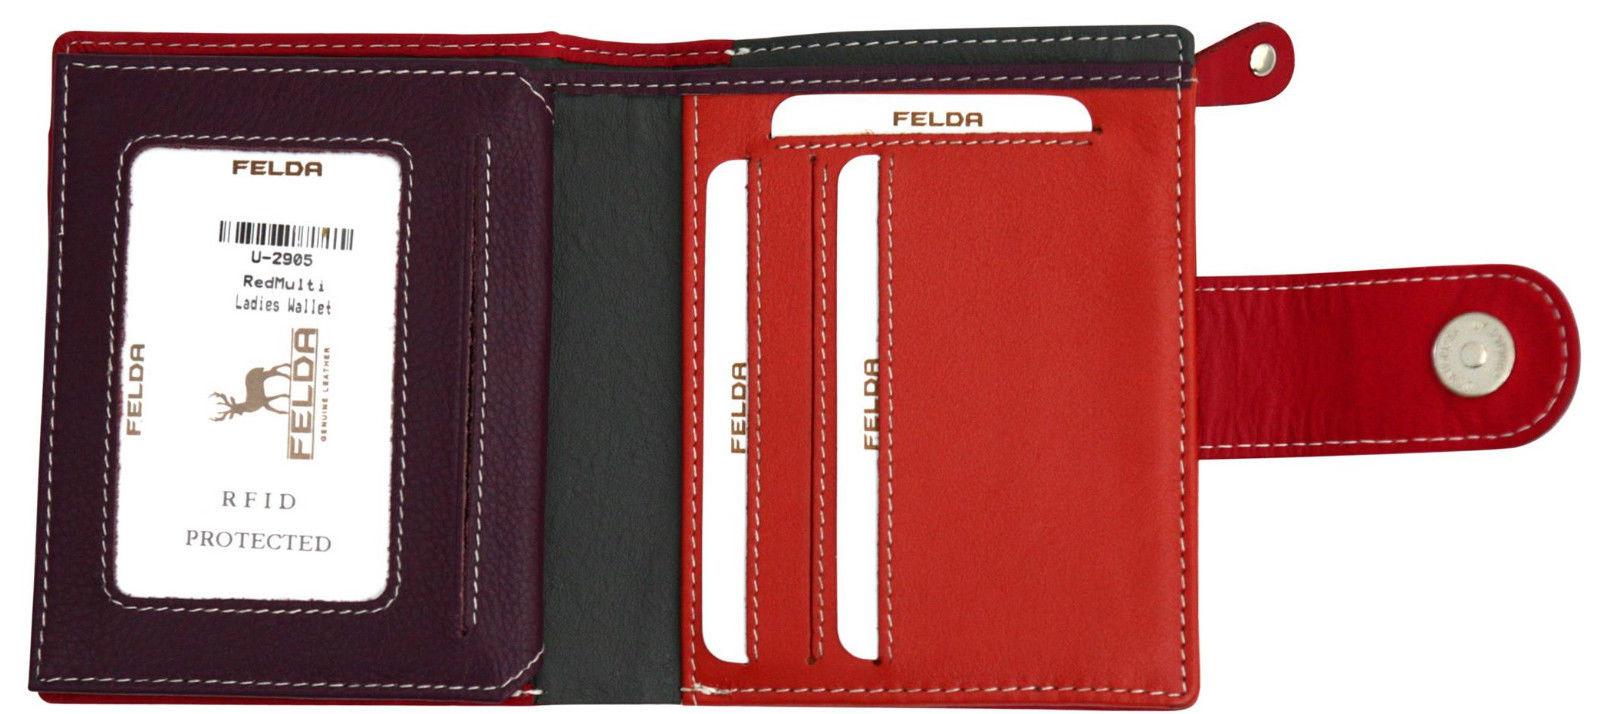 Felda-RFID-onorevoli-MEDAGLIA-amp-Card-Purse-Wallet-Genuine-Leather-Multi-SOFT-BOX-REGALO miniatura 107